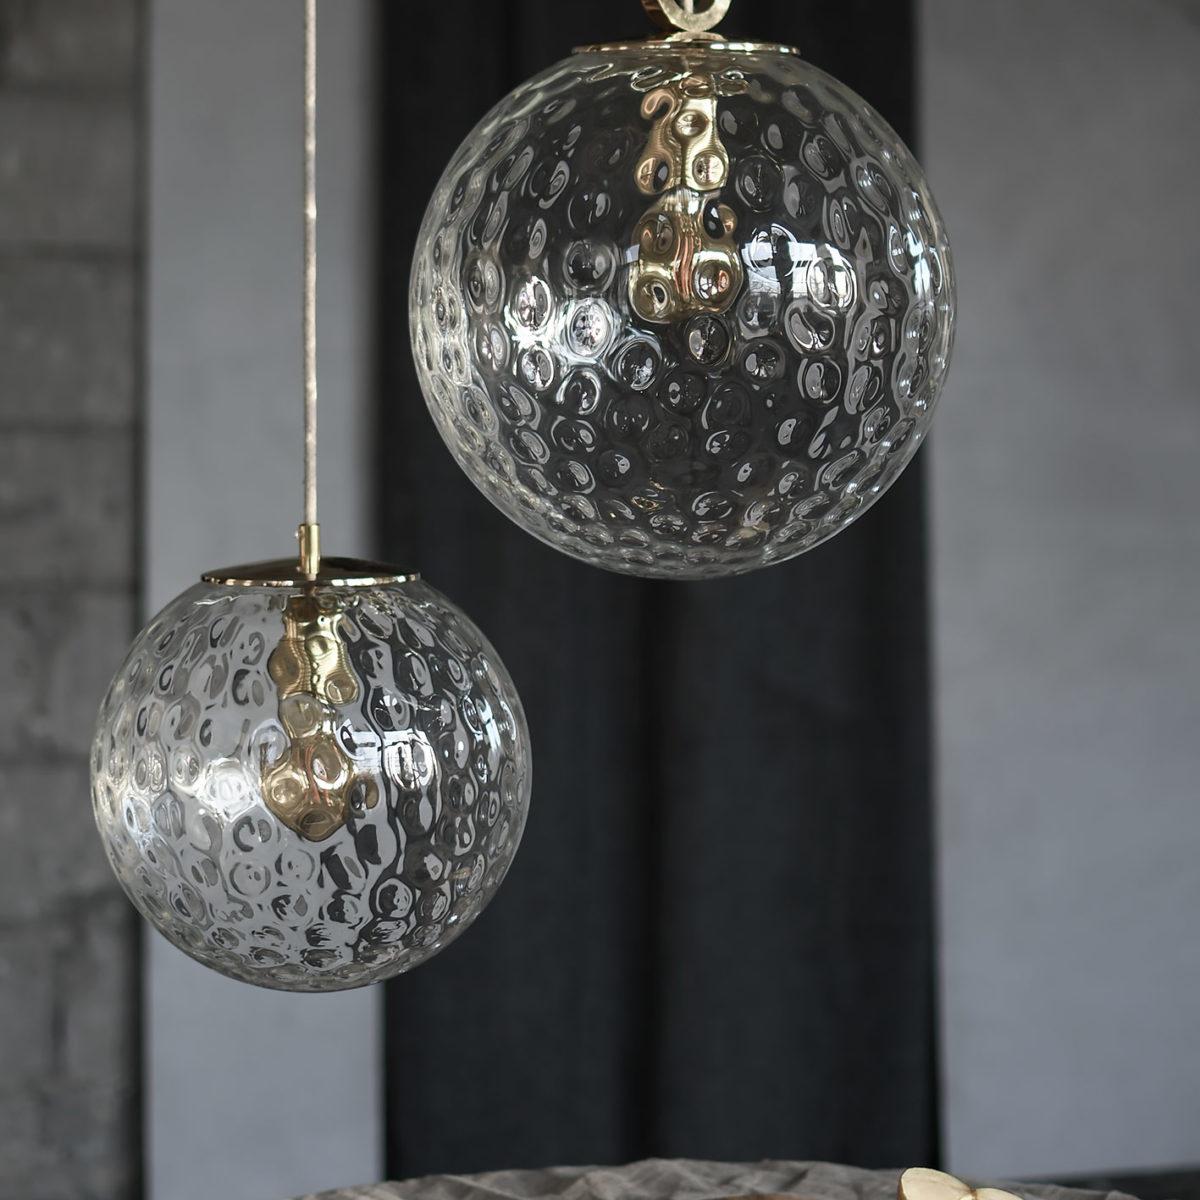 Szklane lampy wiszace kule Reflesyjne 3